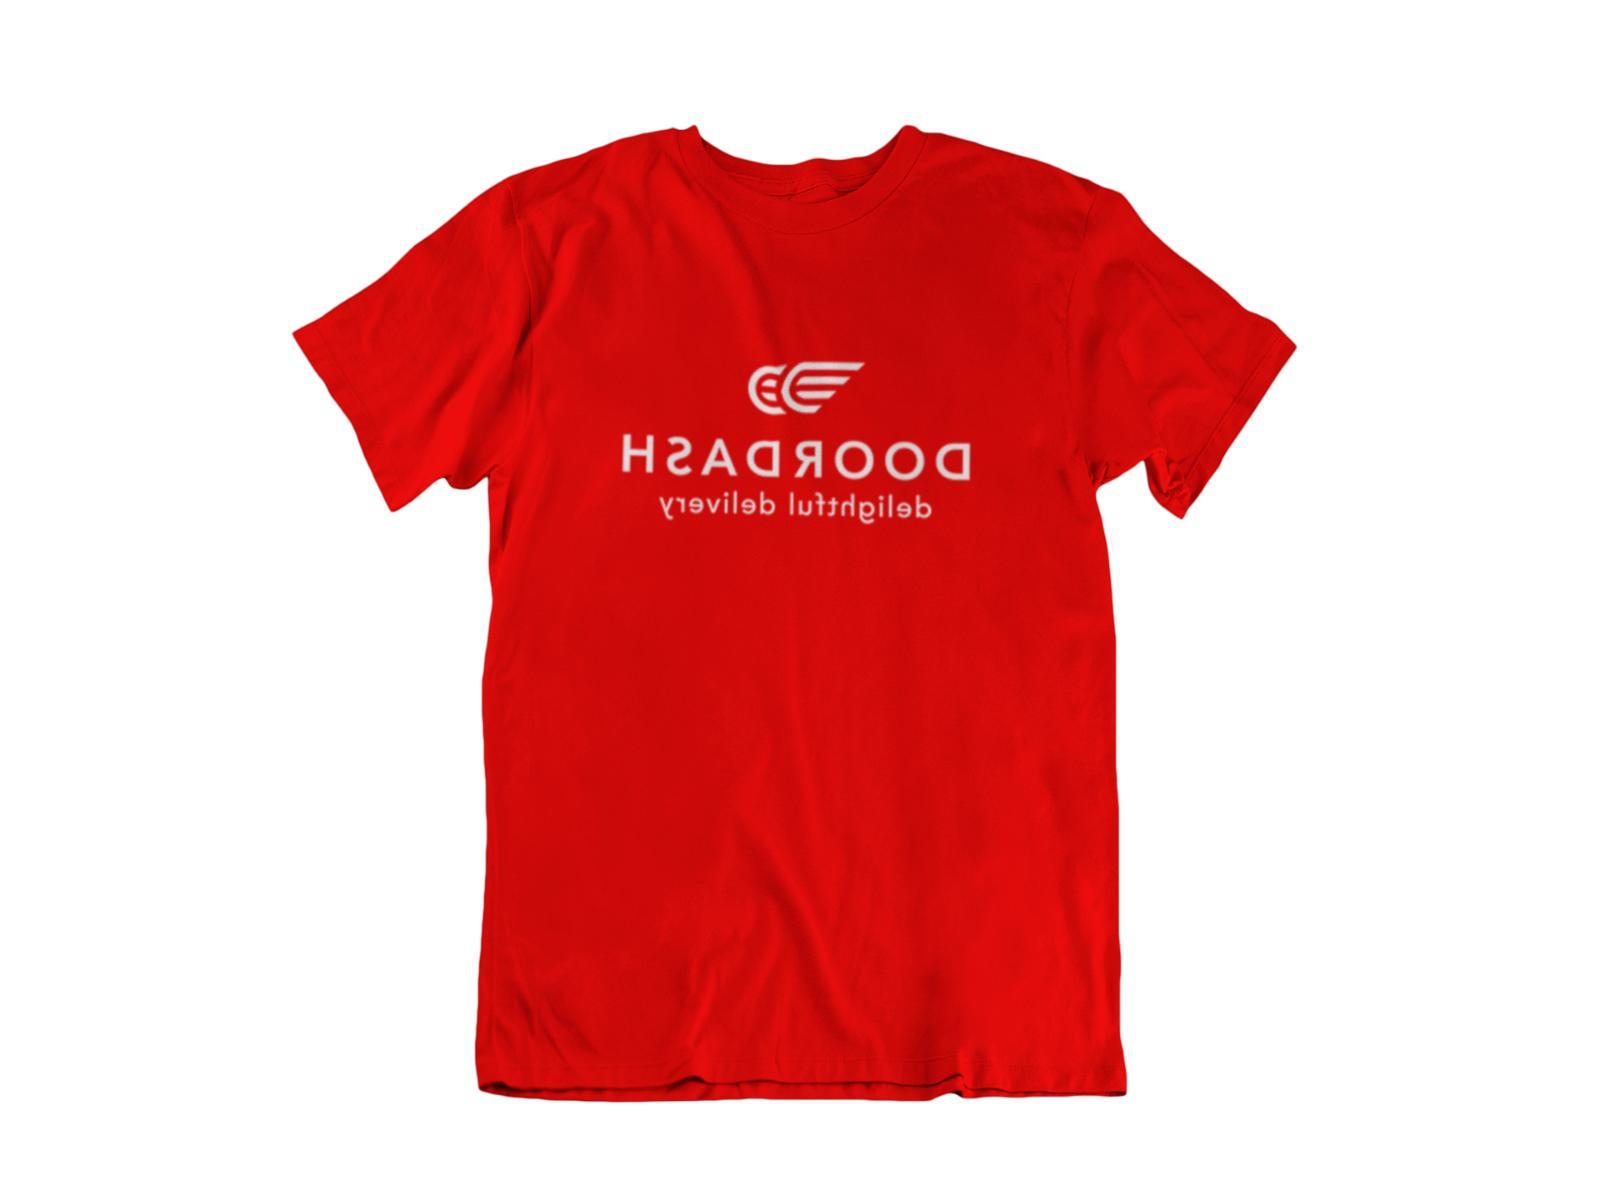 DOOR DASH RED T-Shirt SHIP